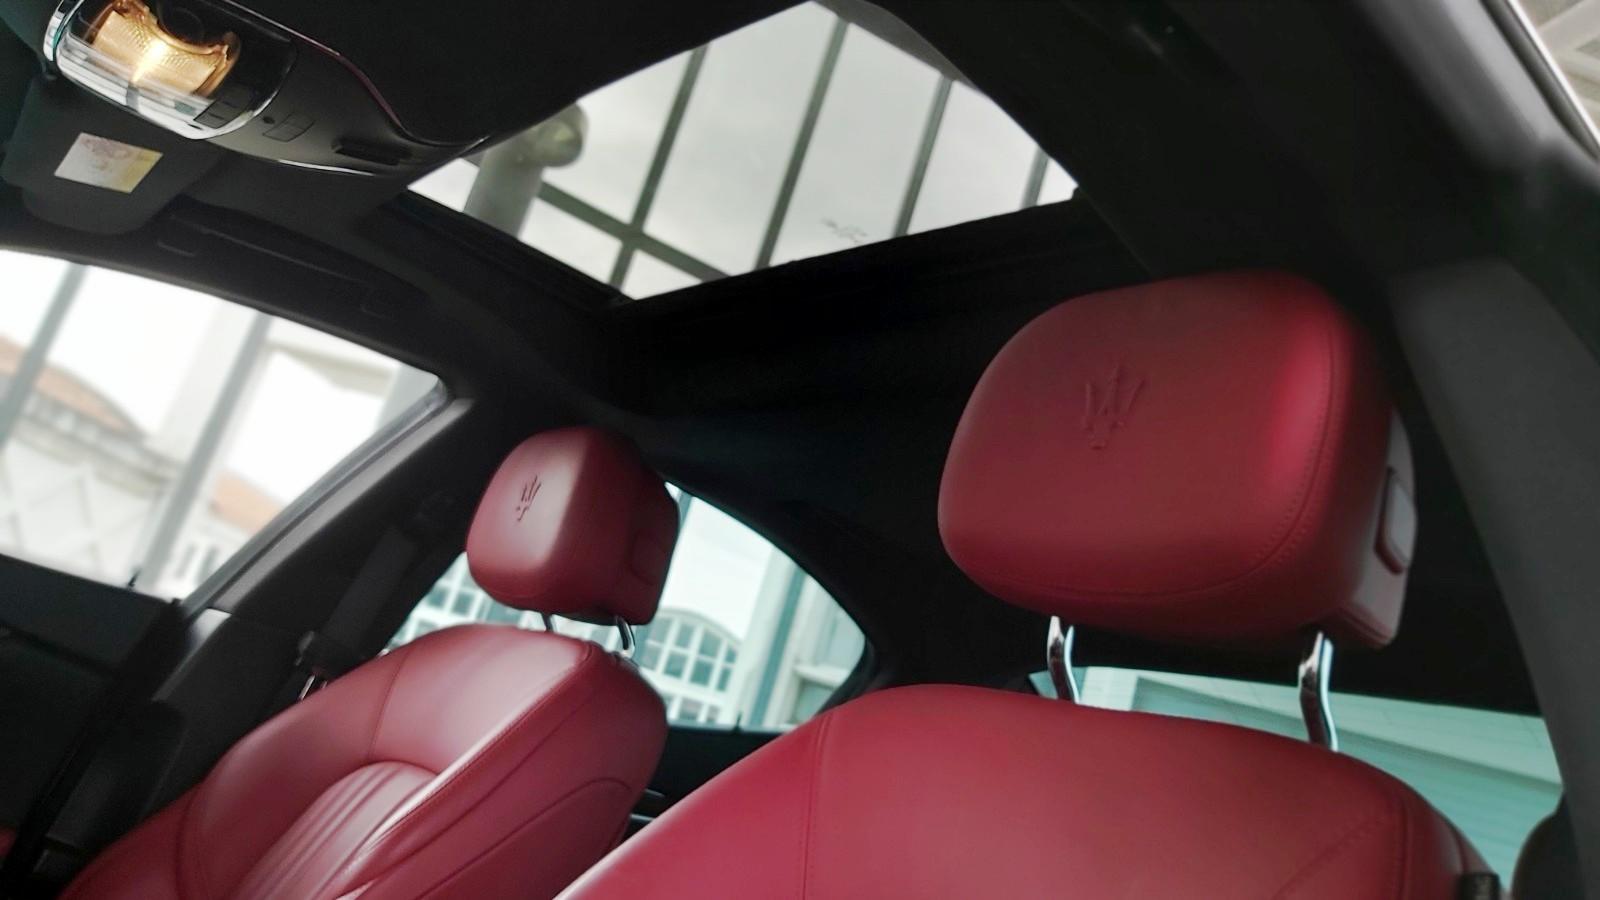 MASERATI Ghibli S Q4 3.0 V6 BT 410cv AWD